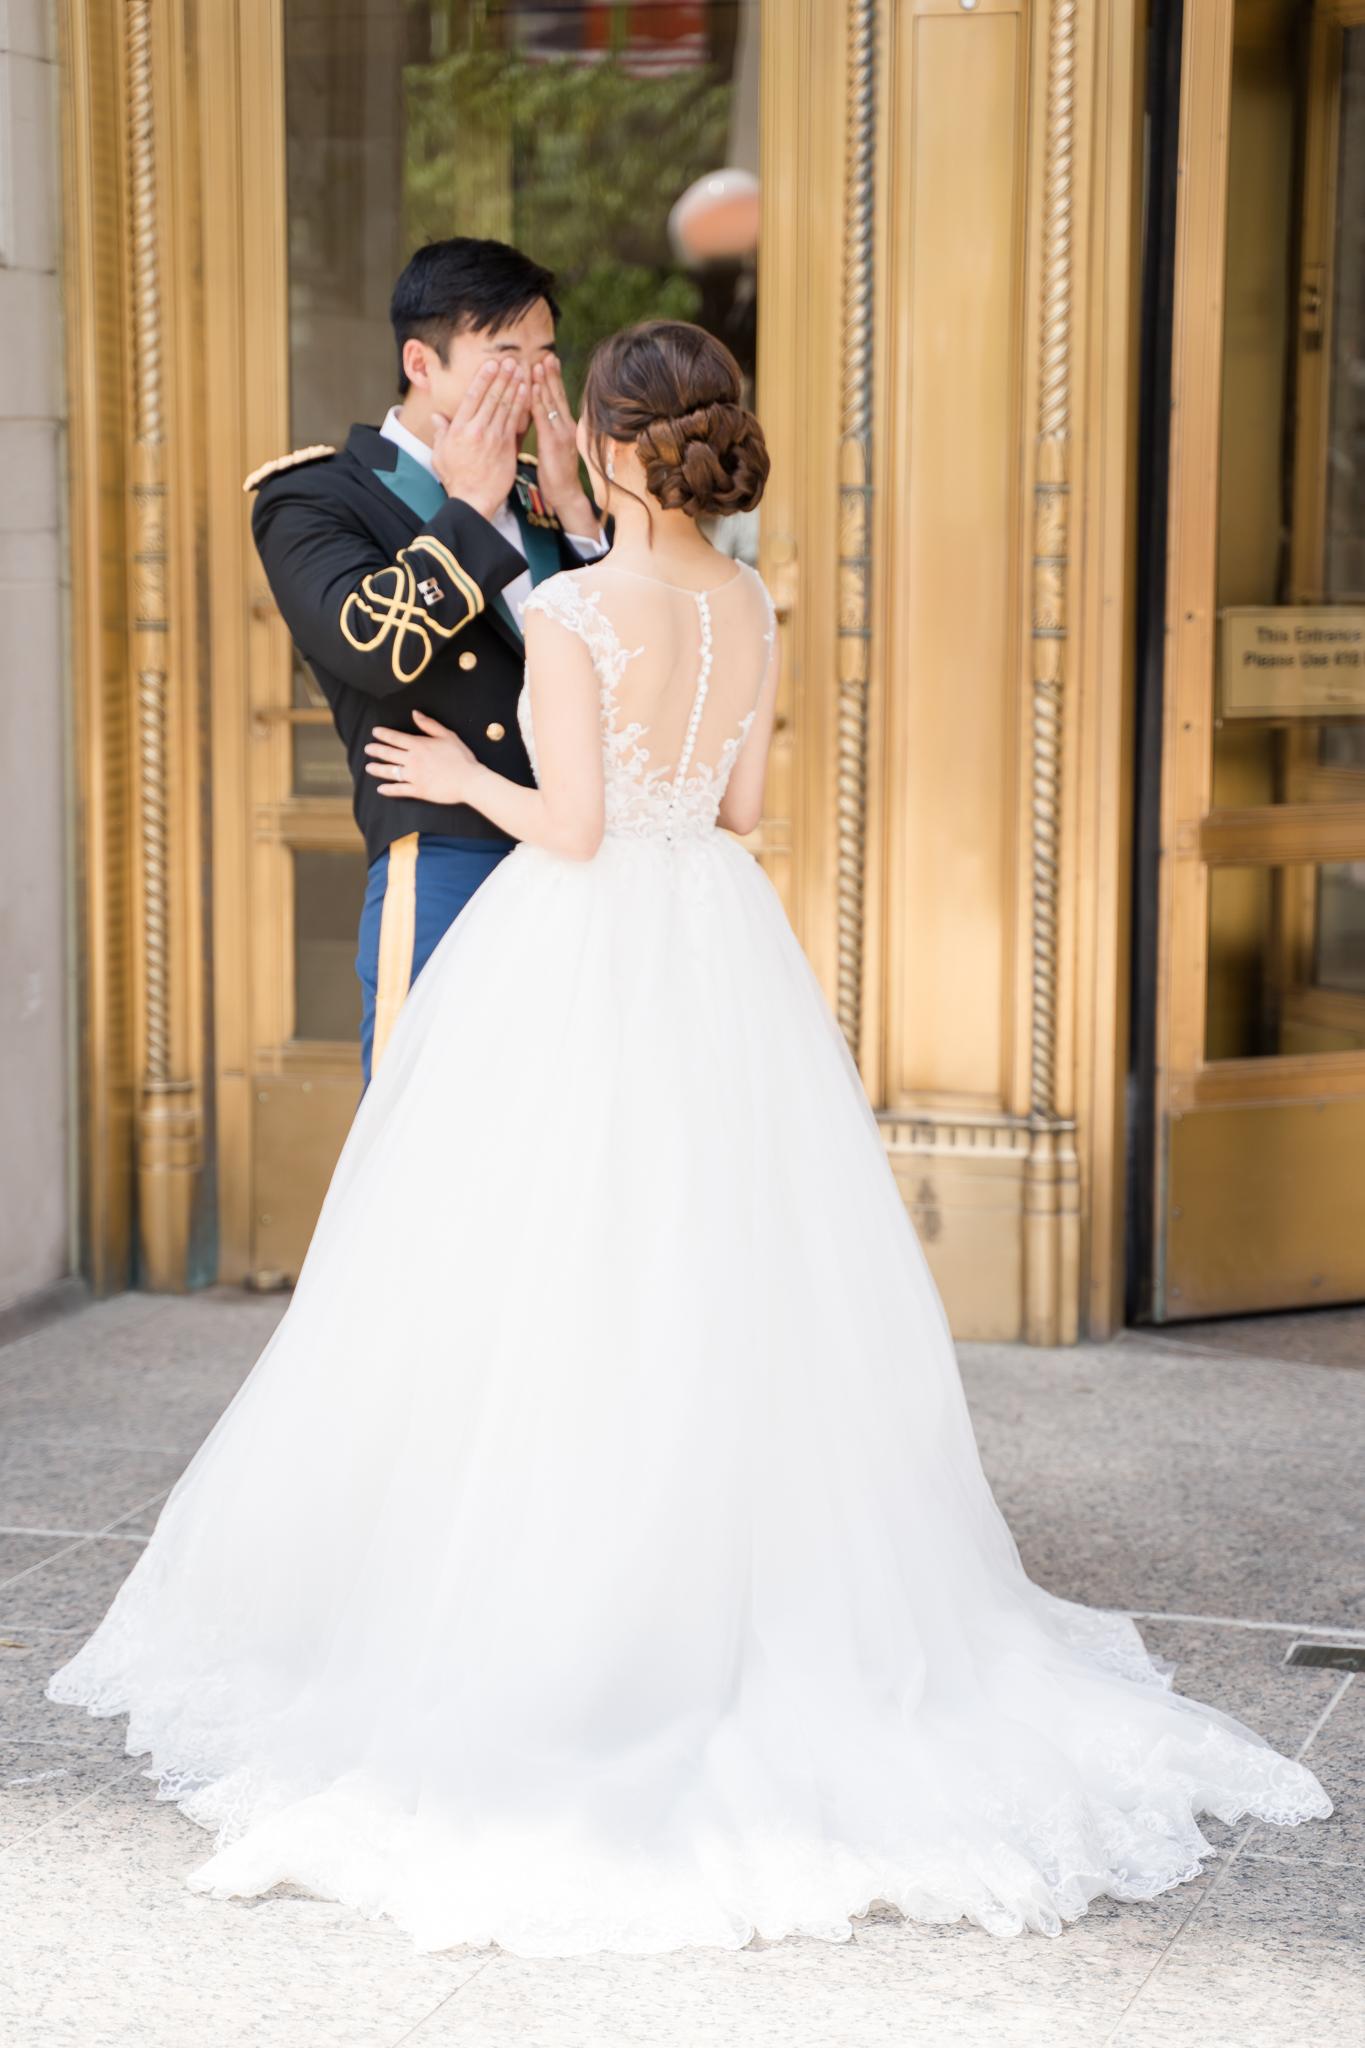 Downtown Chicago Wedding Photographer-71.jpg